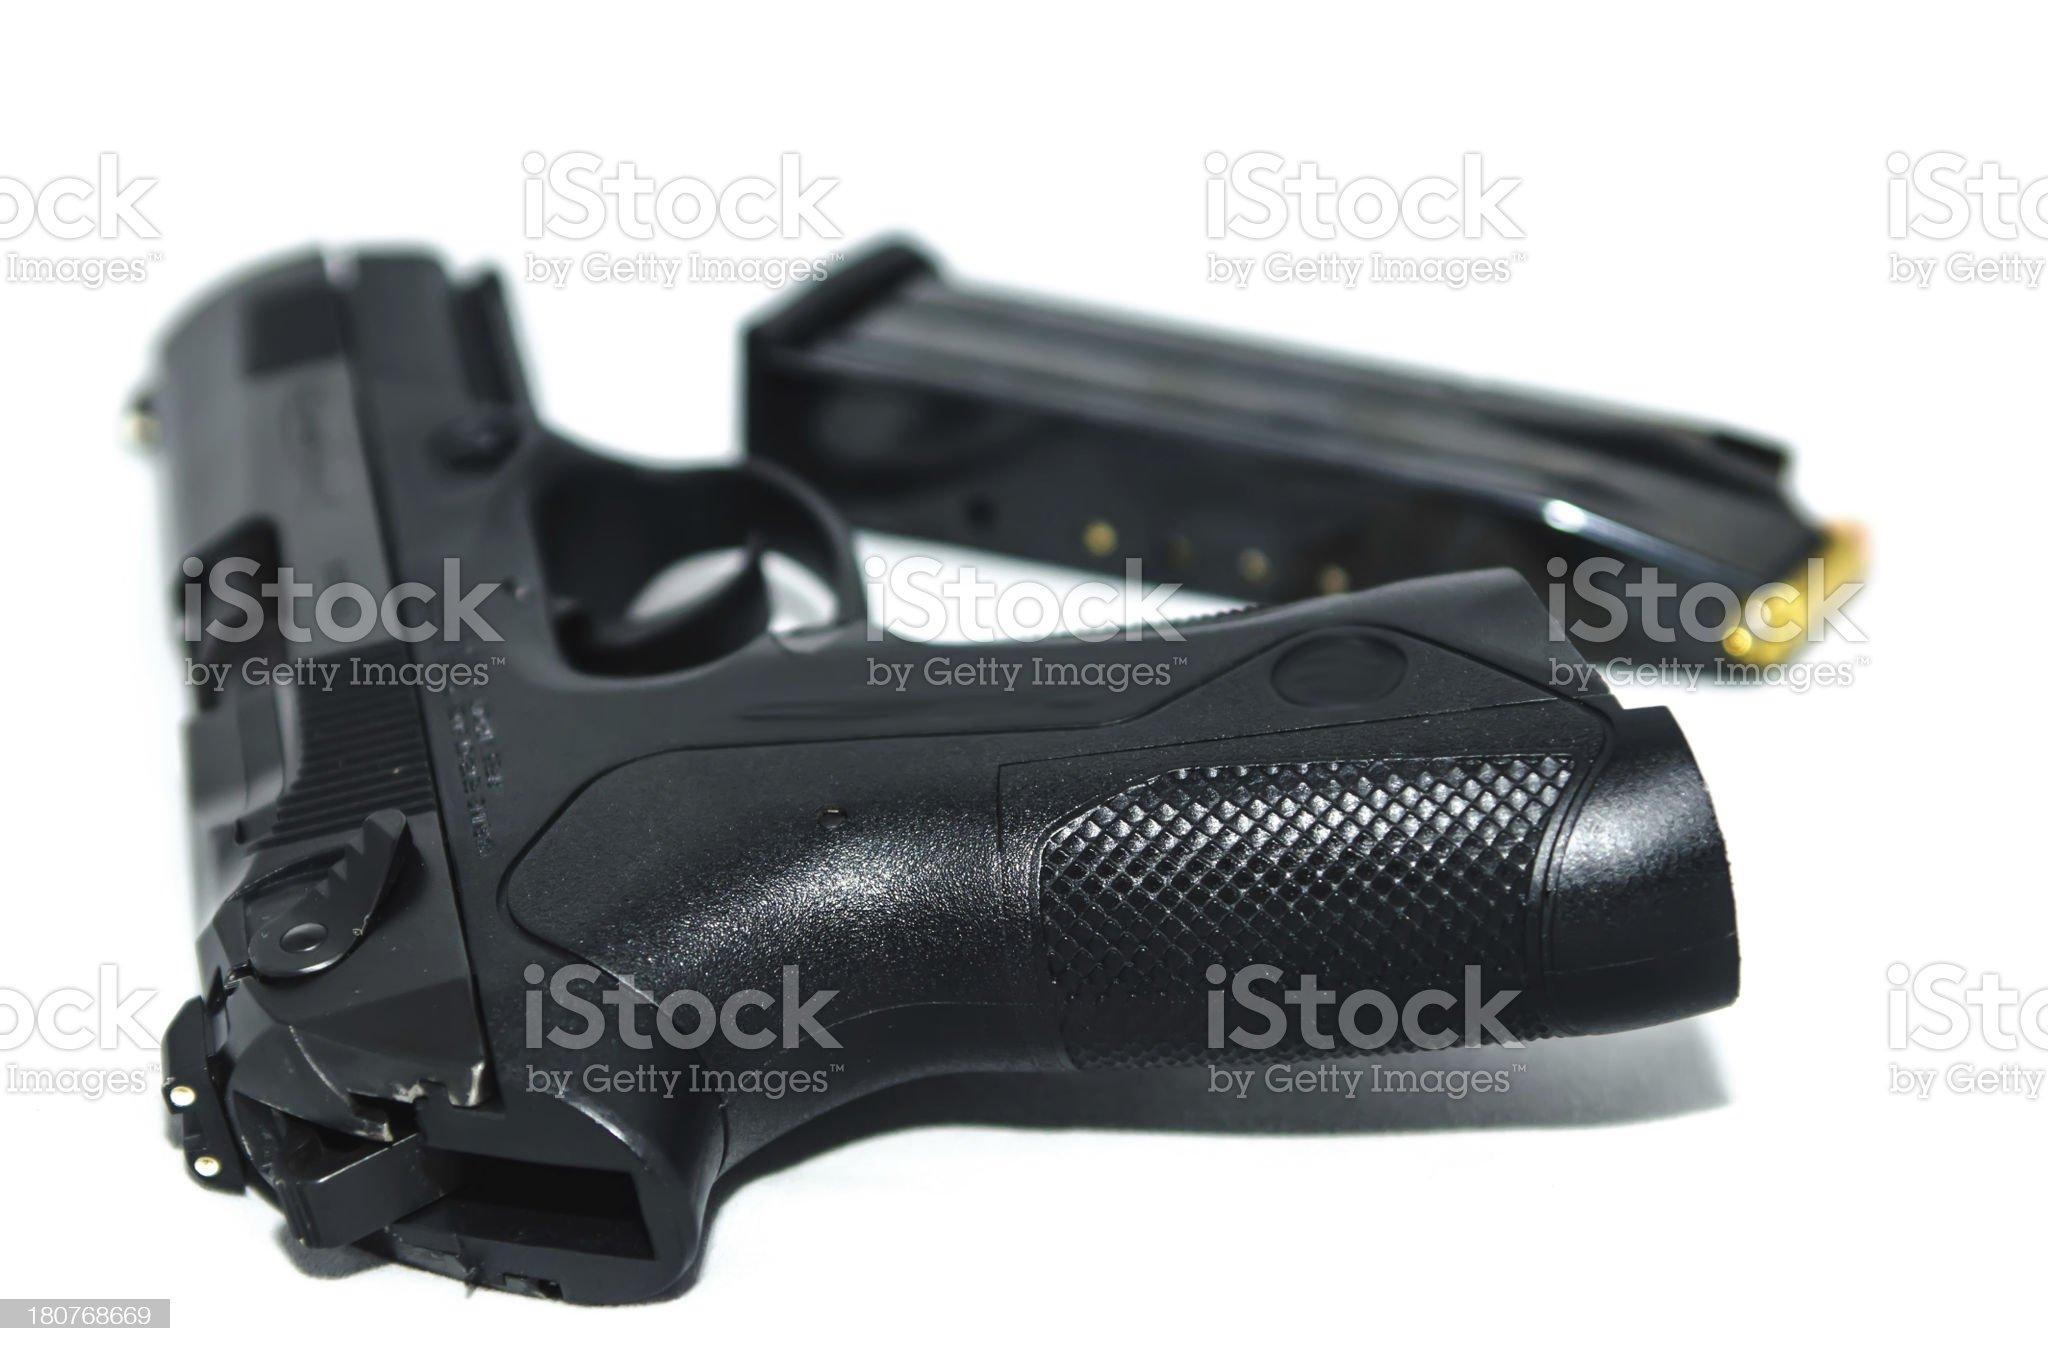 9mm gun and ammo royalty-free stock photo